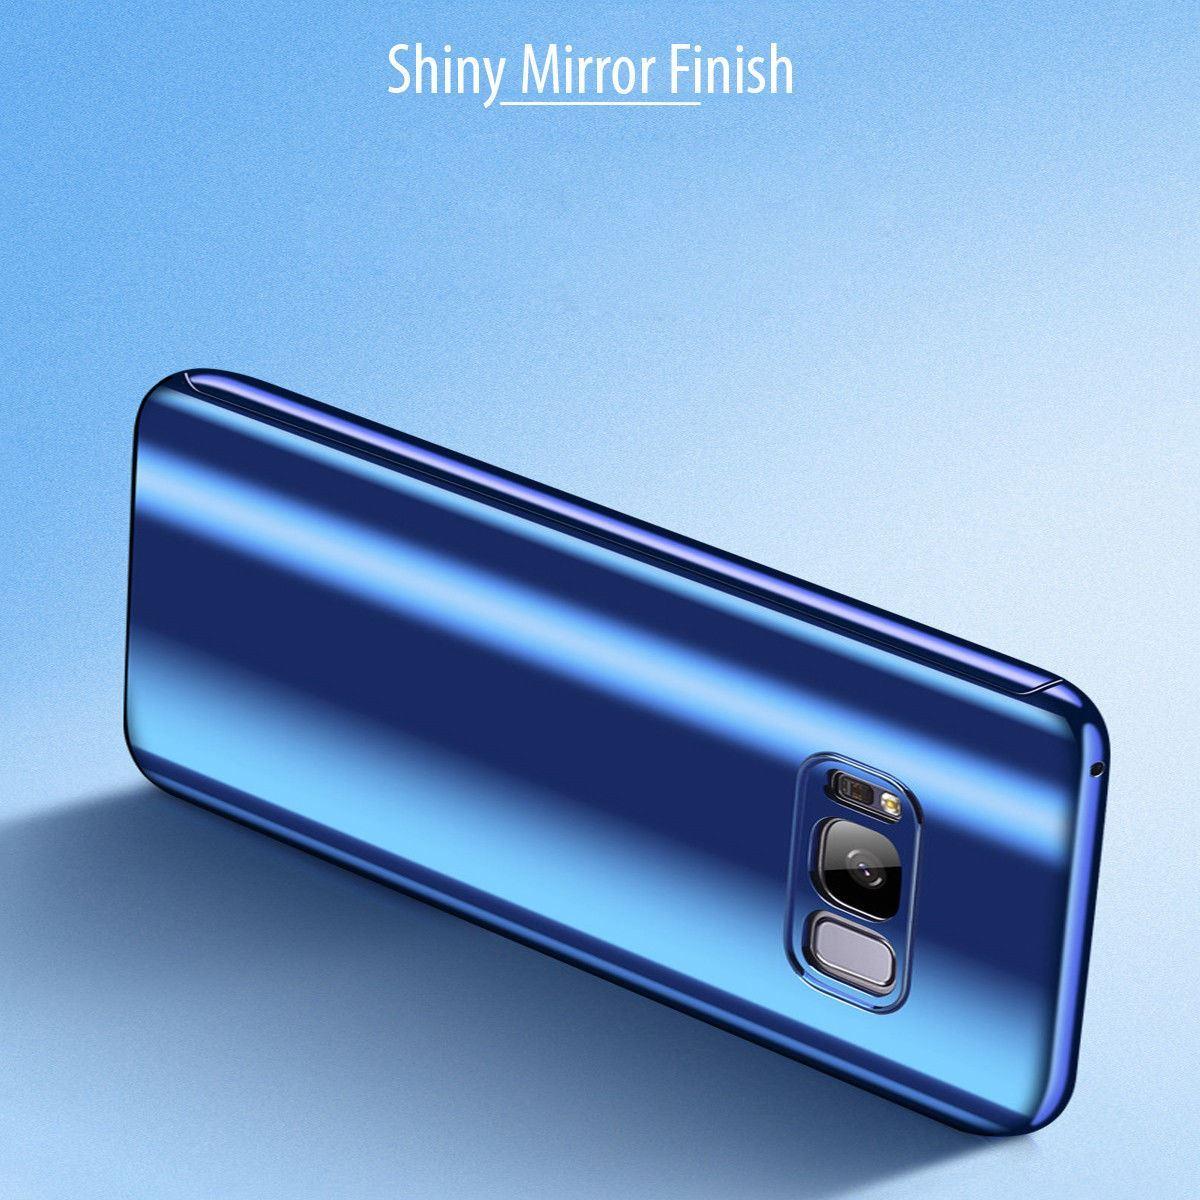 Shockproof-Hybrid-360-Ultra-Thin-Mirror-Hard-Case-Samsung-Galaxy-S7-edge-S8-S9 thumbnail 27